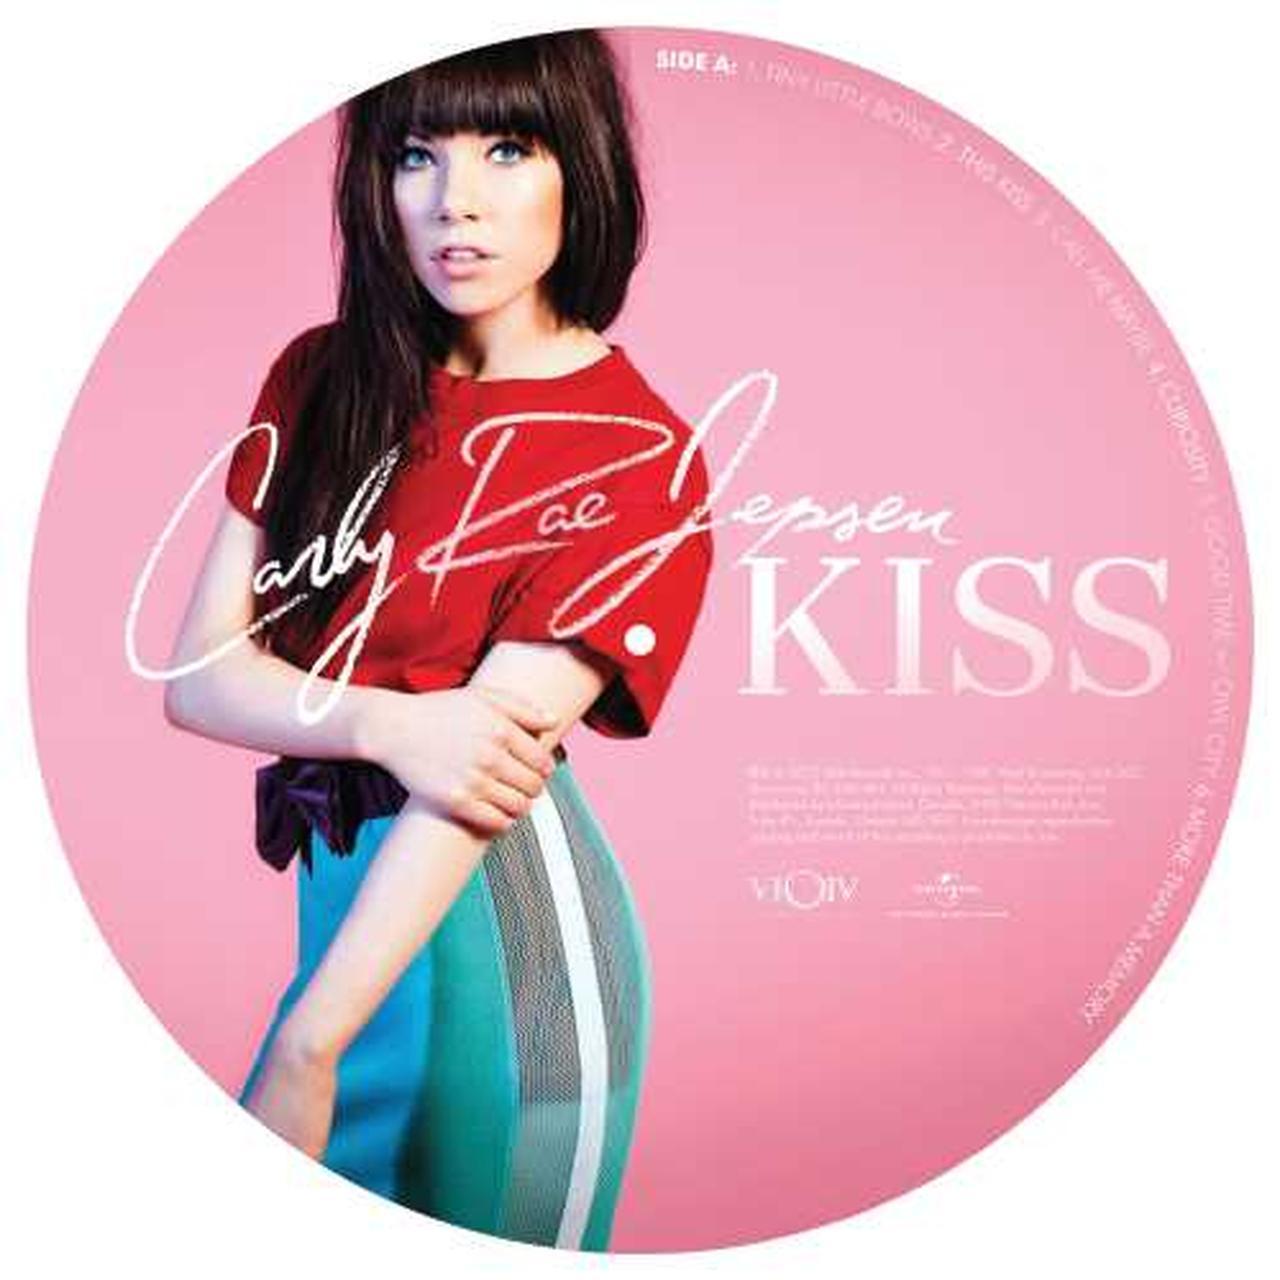 Carly Rae Jepsen KISS Vinyl Record